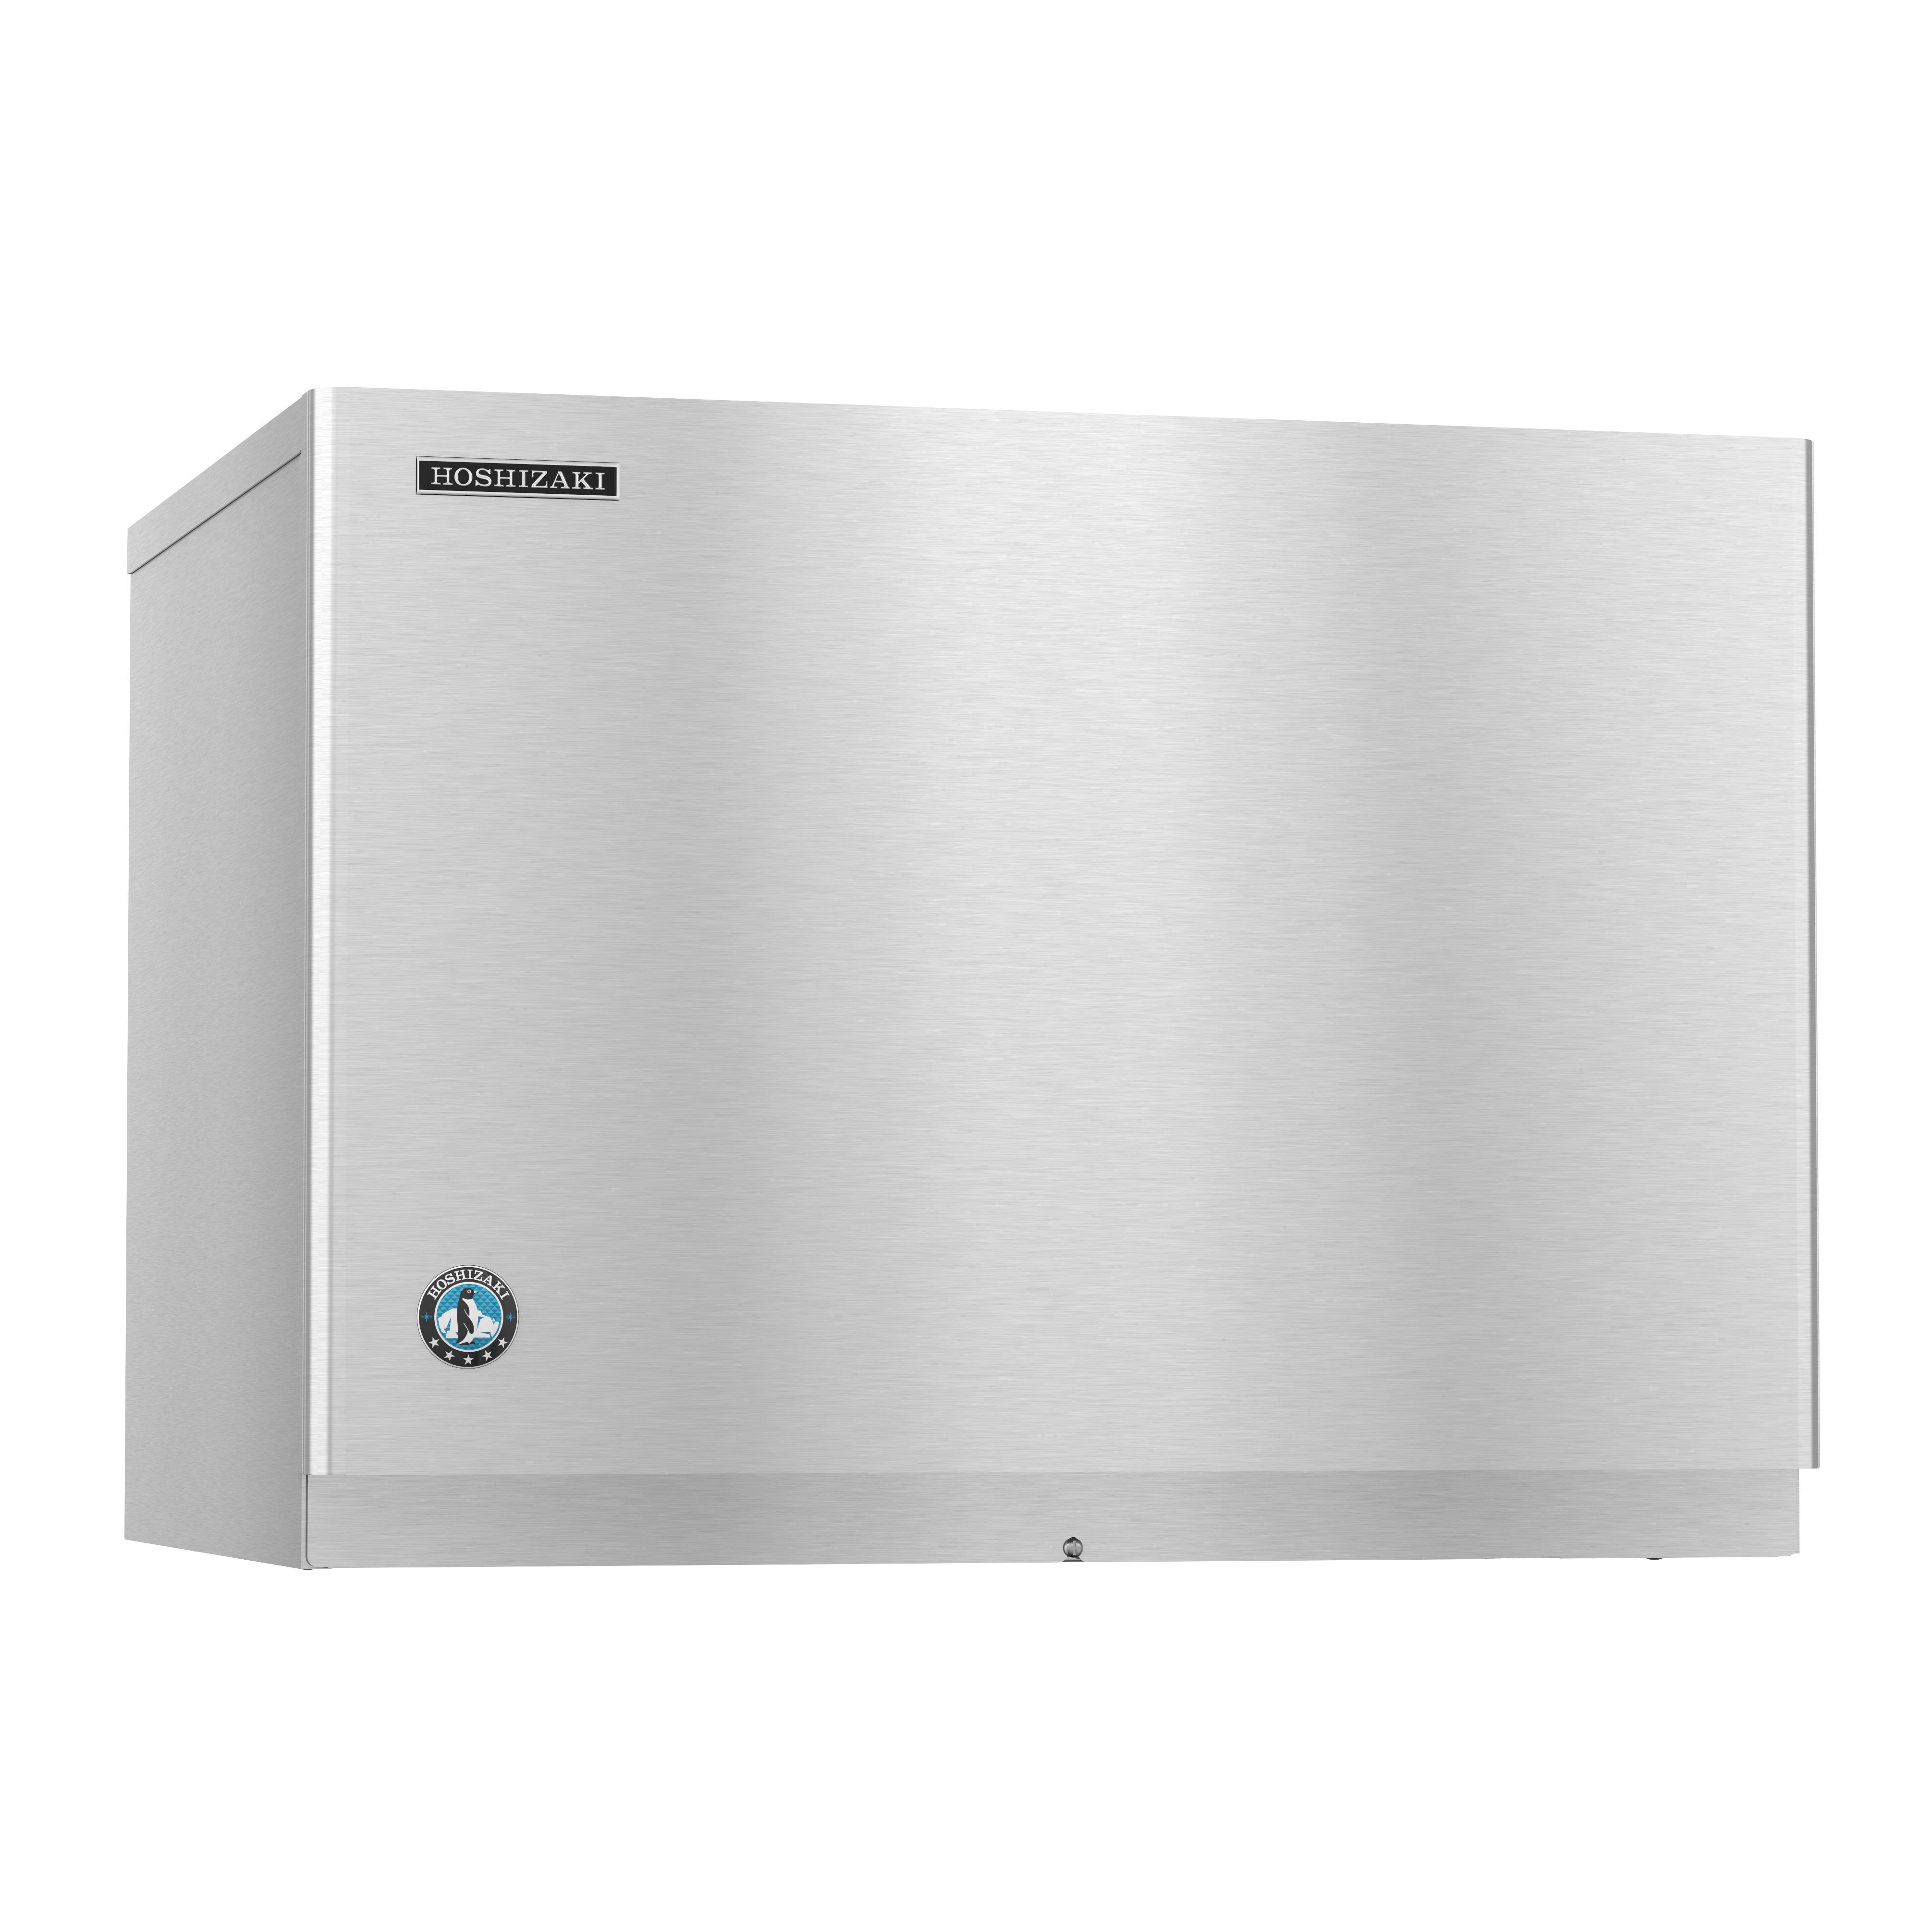 Hoshizaki KMD-460MWJ ice cubers, ice storage & ice dispensers